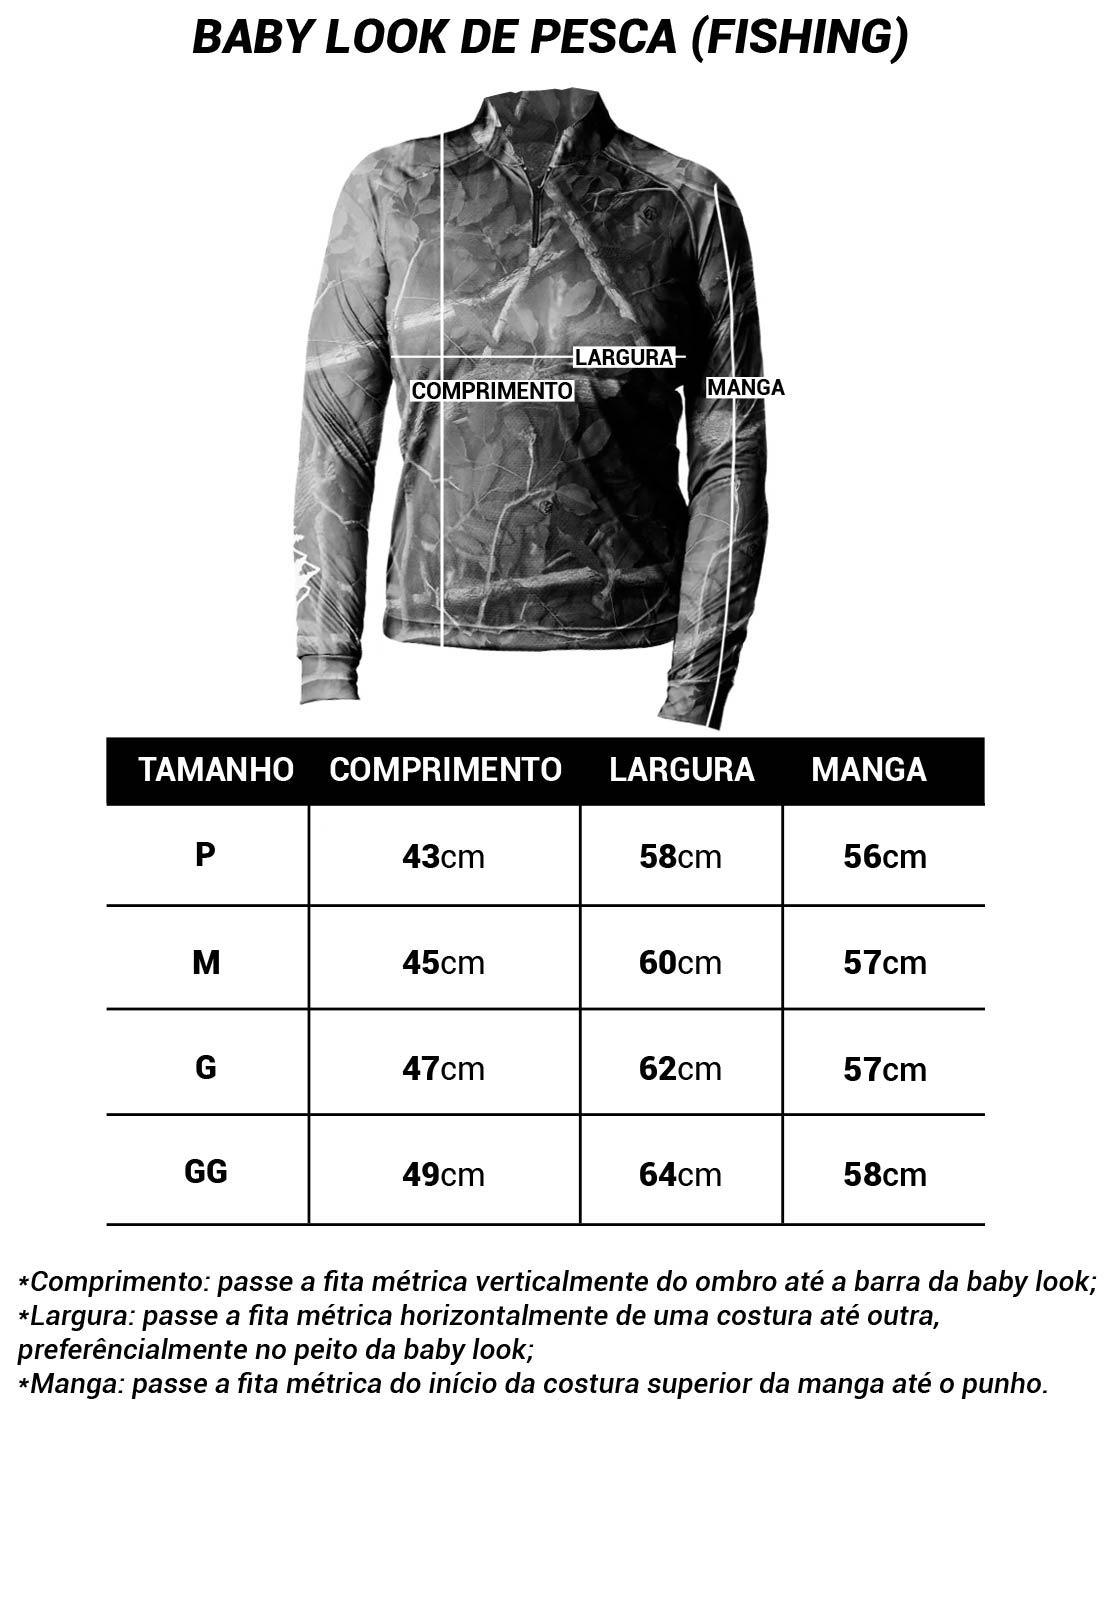 CAMISA DE PESCA FISH TECH PRO 03 FEMININA + BANDANA GRÁTIS  - Real Hunter